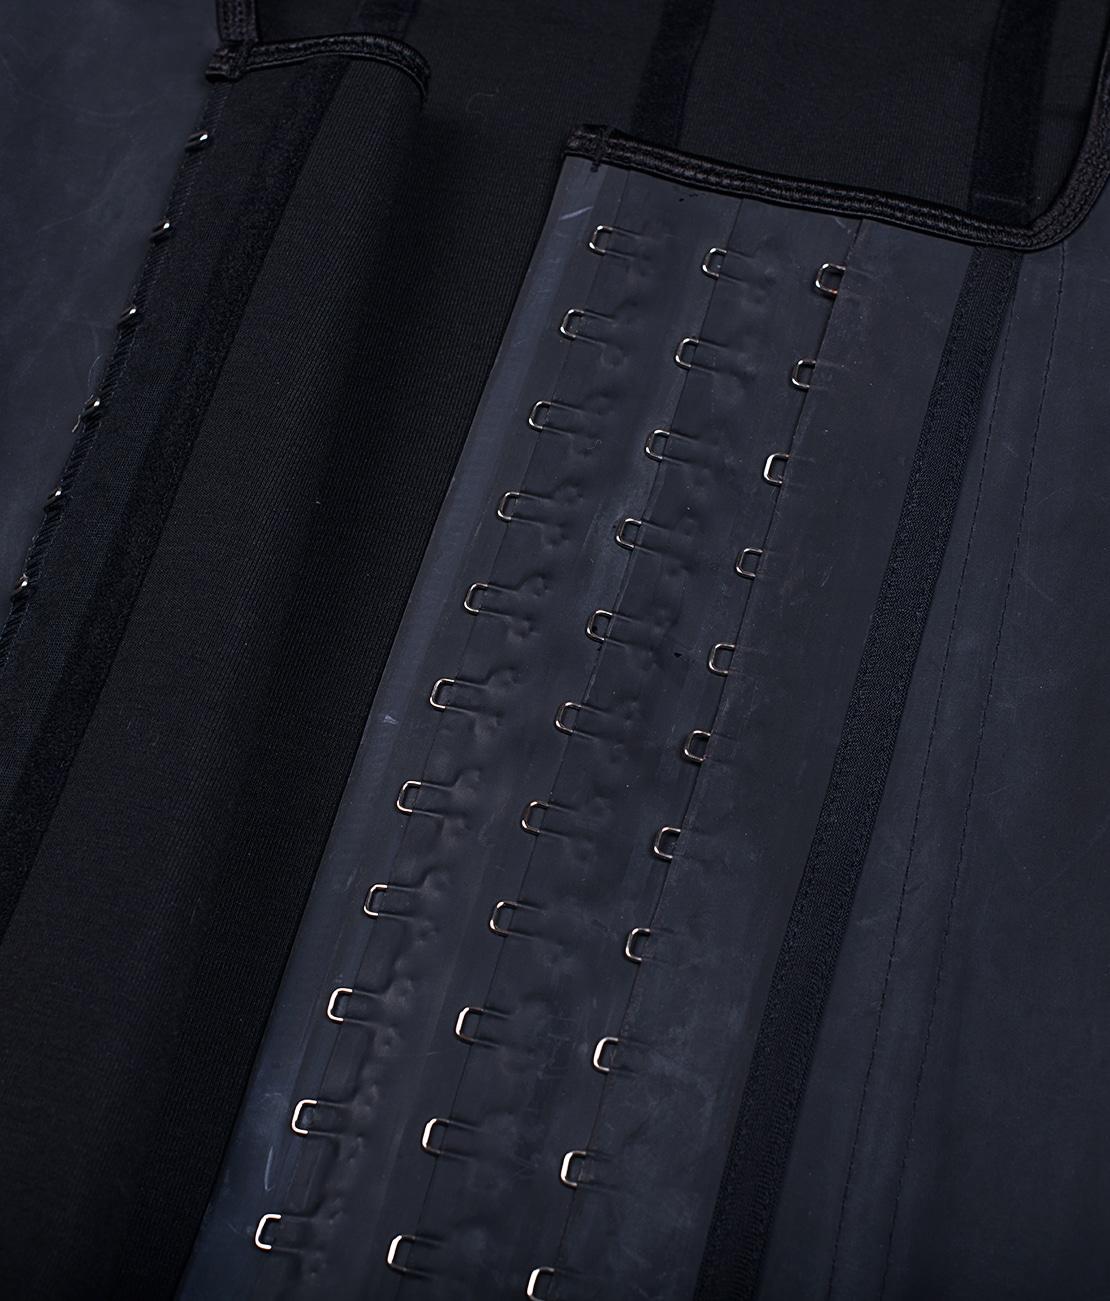 Corset Femme Packshot Detail 2